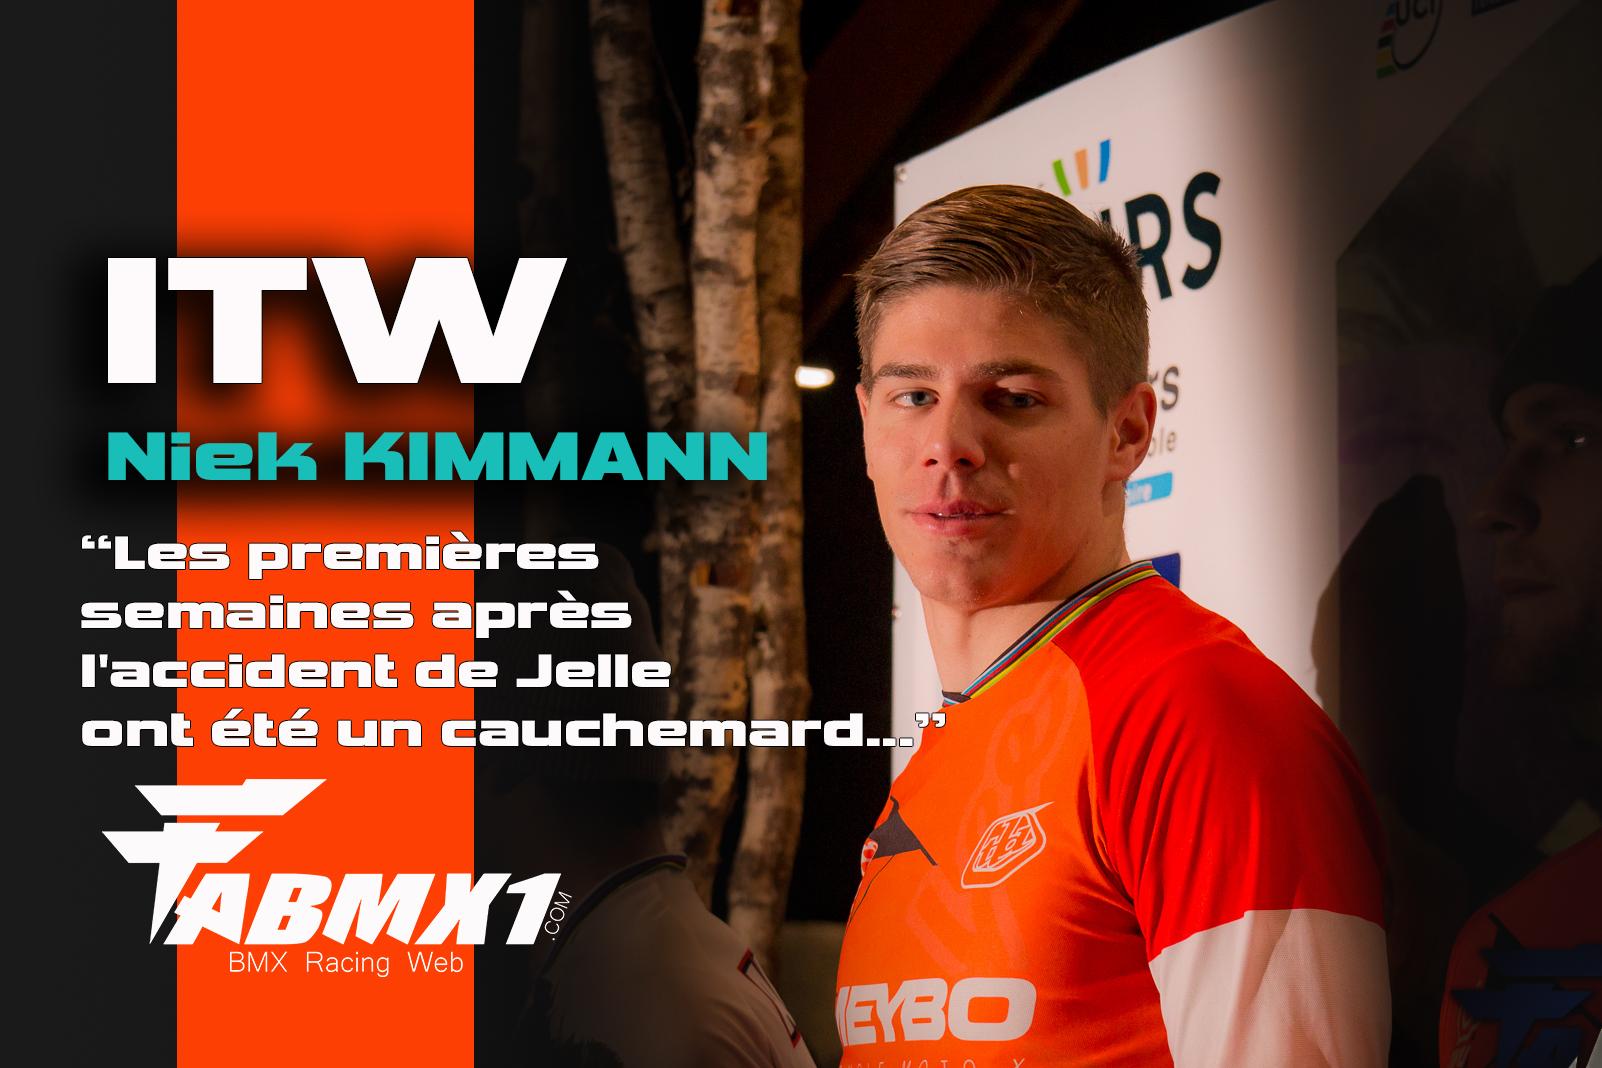 ITW (FR/EN) Niek KIMMANN: Le champion humble